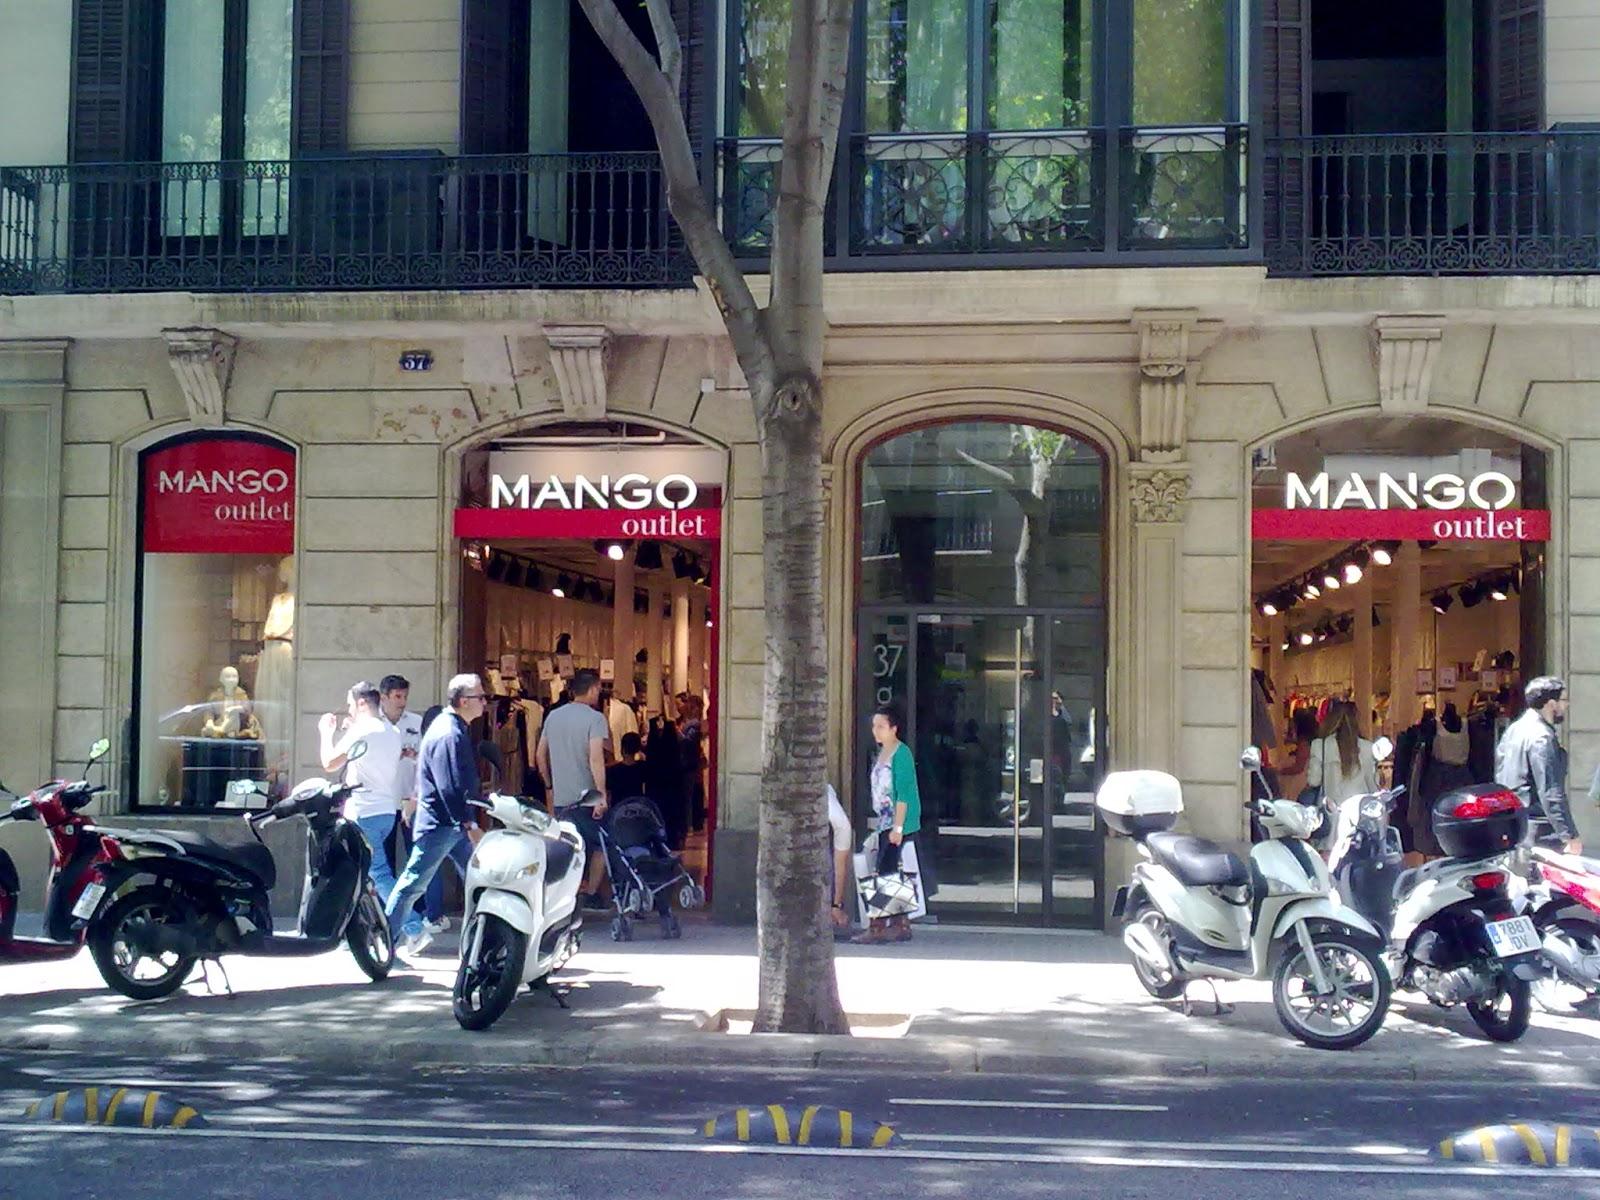 bargainhunter bcn calle girona 08010 barcelona mango